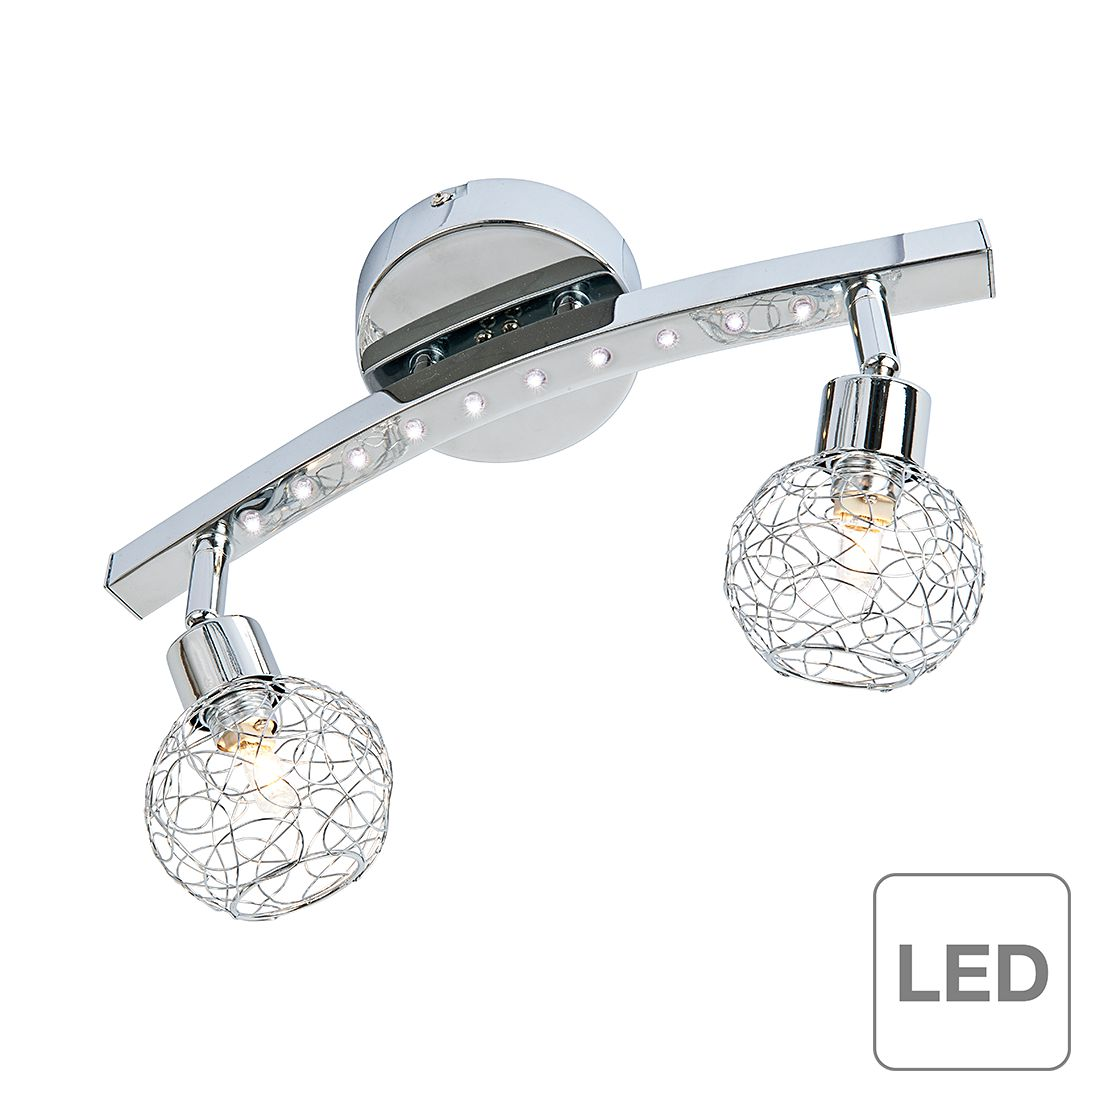 LED-Balken Leo - 12-flammig, Nino Leuchten